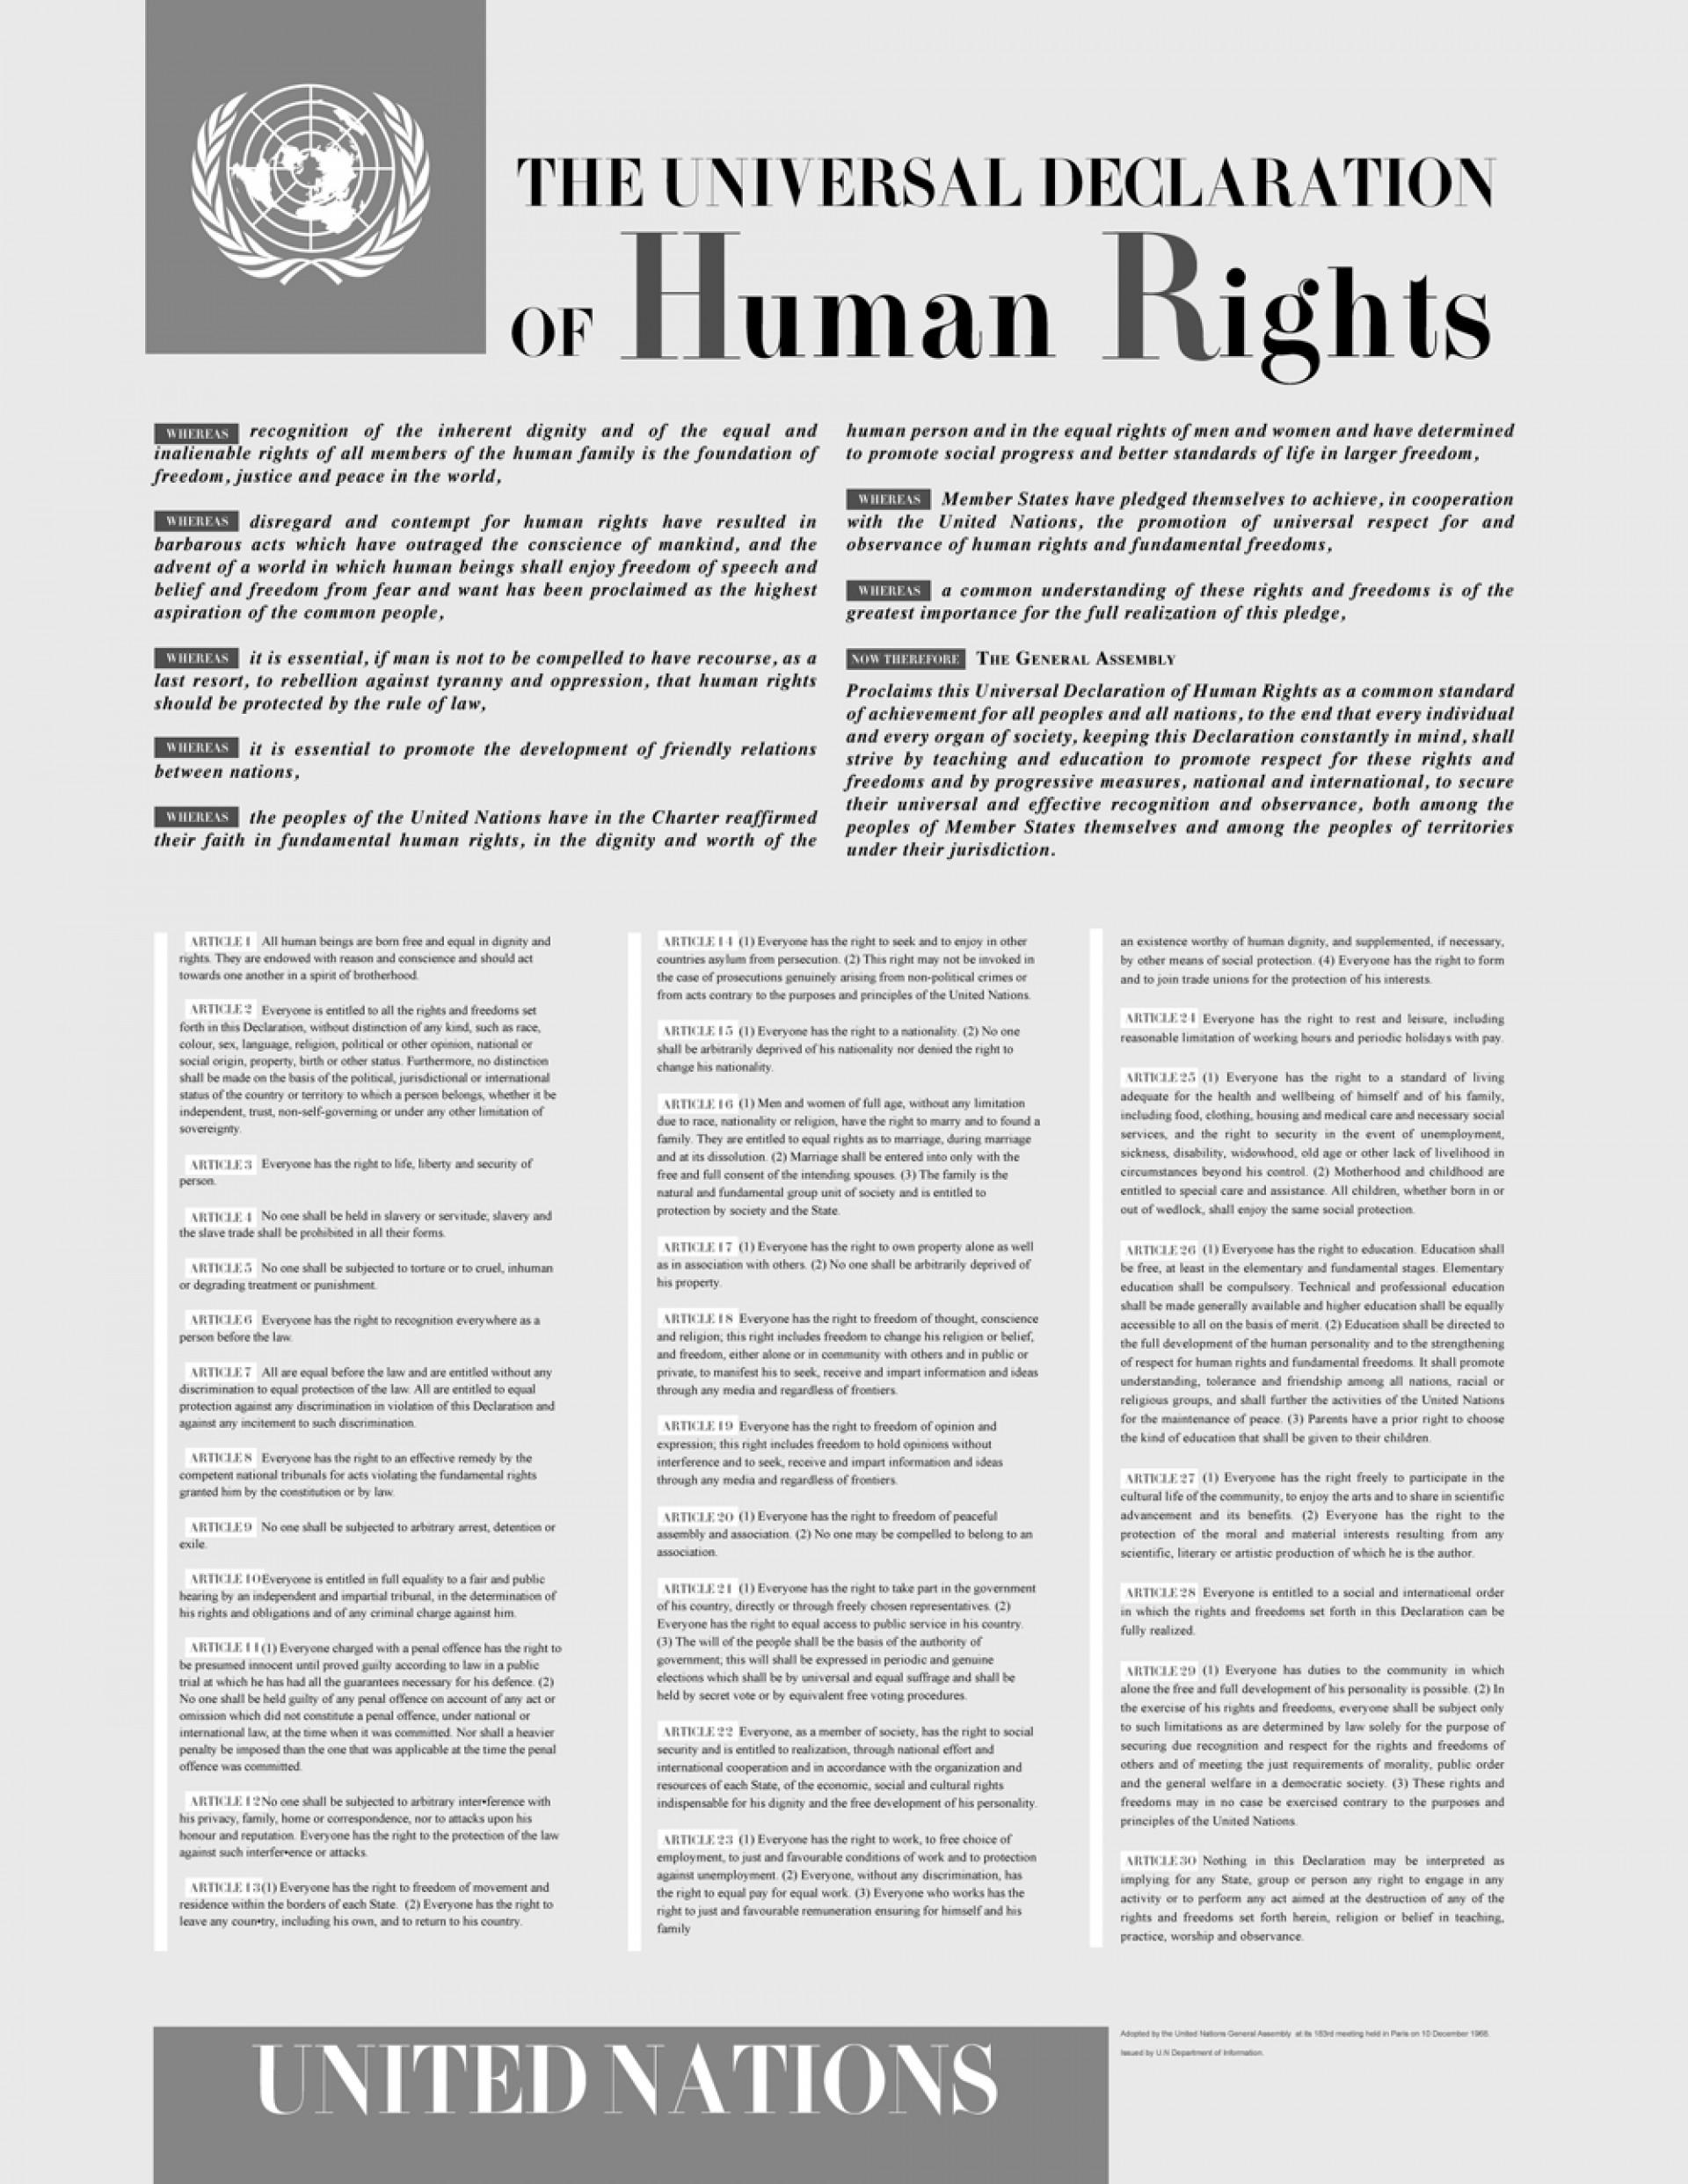 004 Thematic Essay On Human Rights Universaldeclarationofhumanrights Stunning Justice 1920